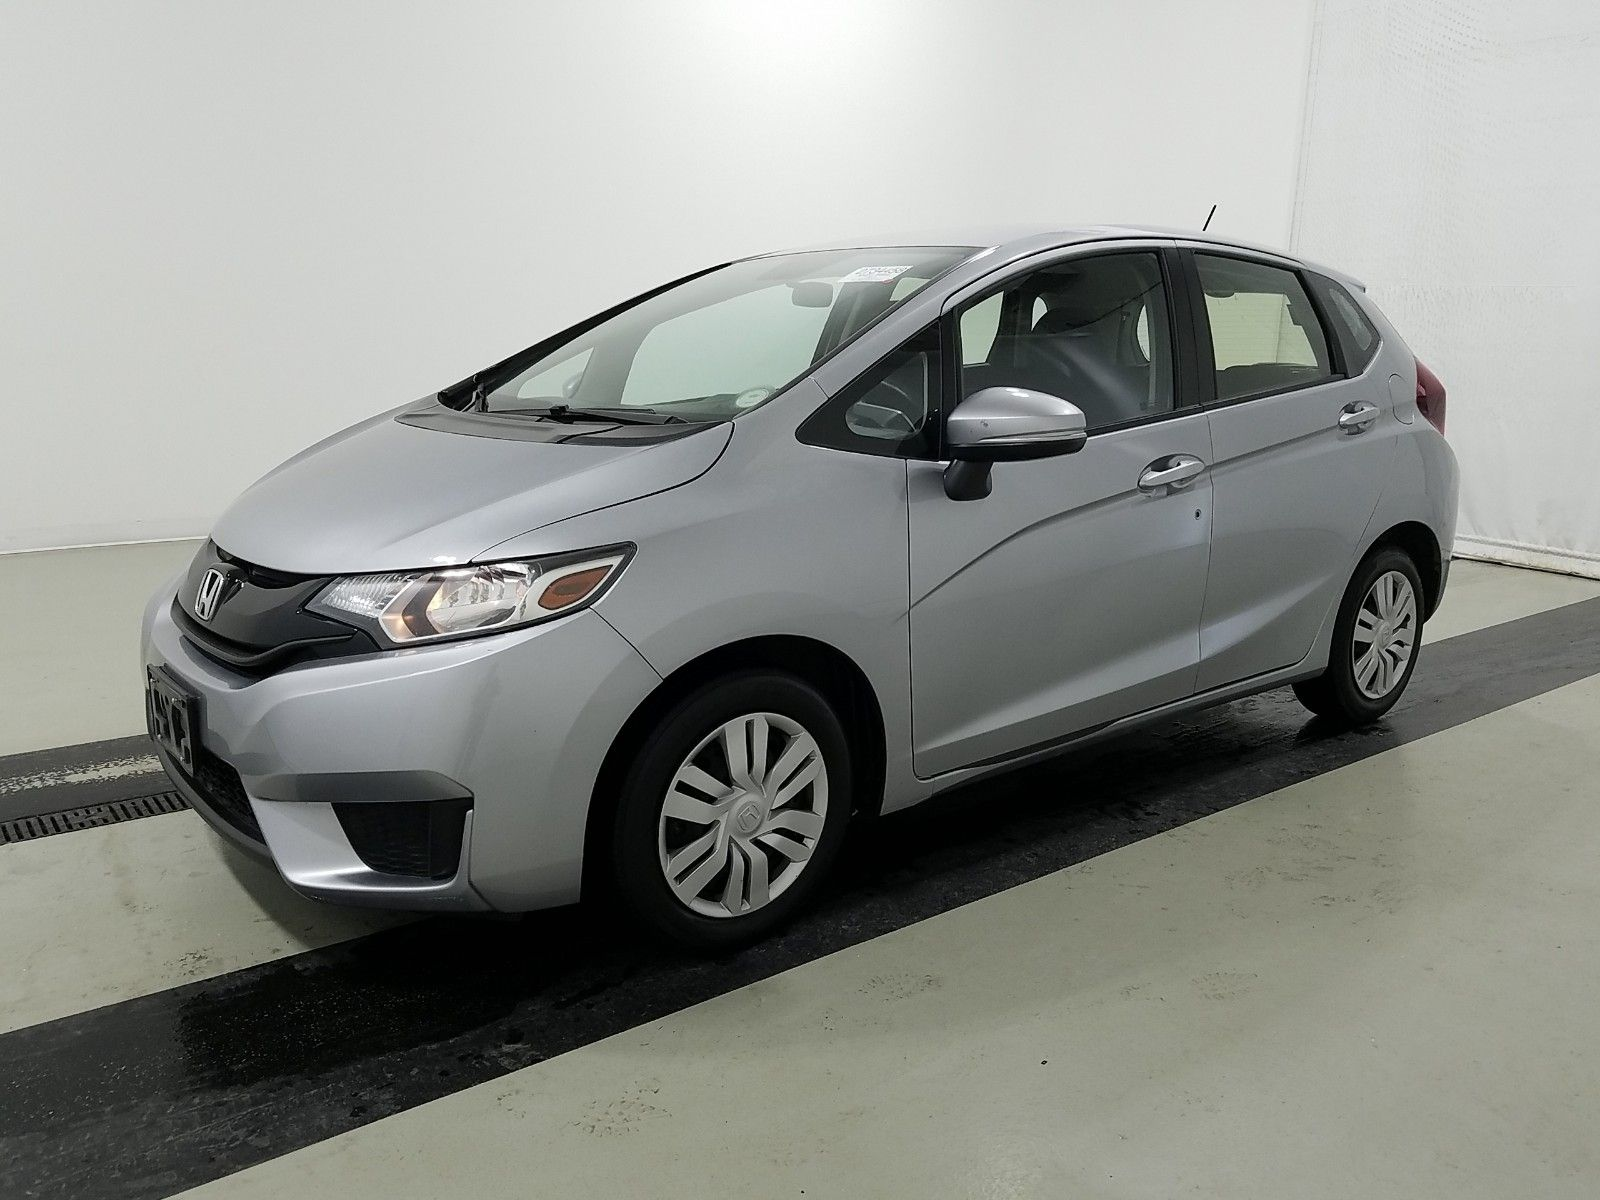 2017 Honda Fit 1.5. Lot 99913212098 Vin JHMGK5H56HS016465